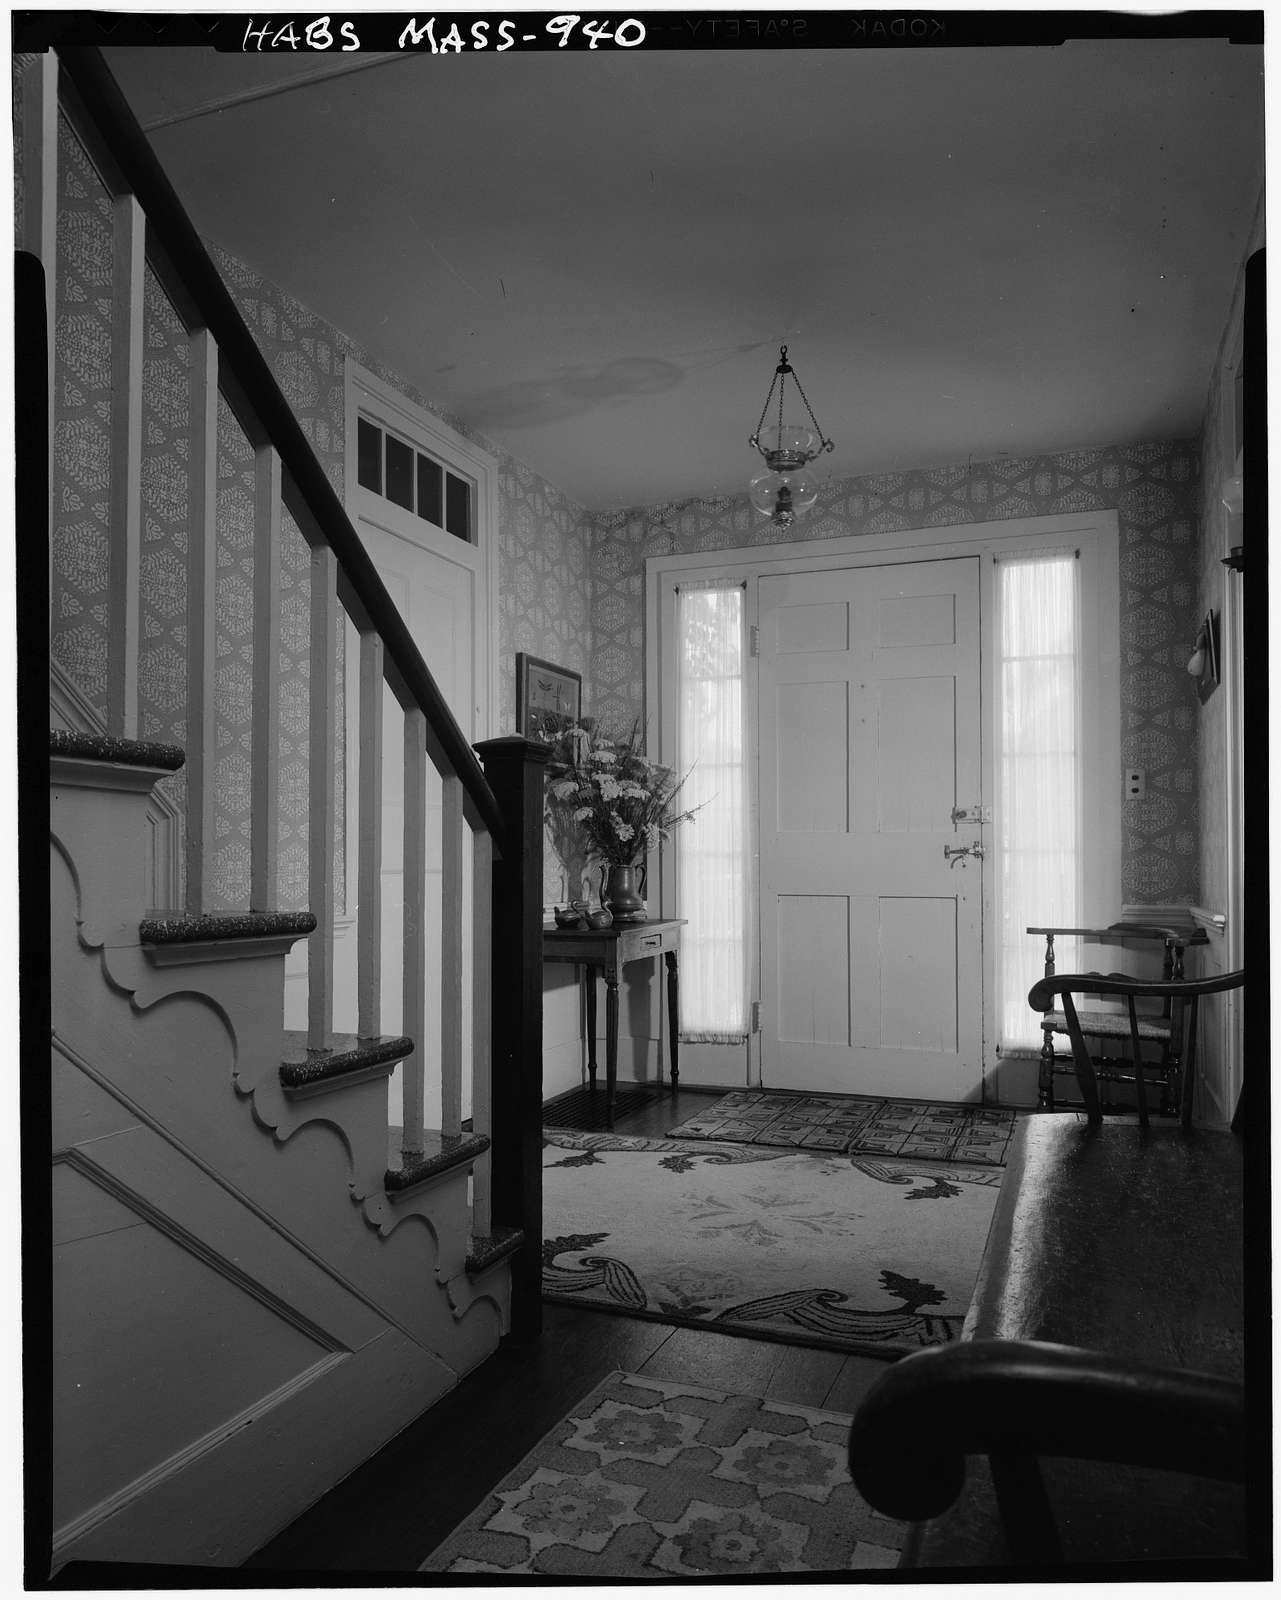 Joseph Starbuck House, 4 New Dollar Lane, Nantucket, Nantucket County, MA